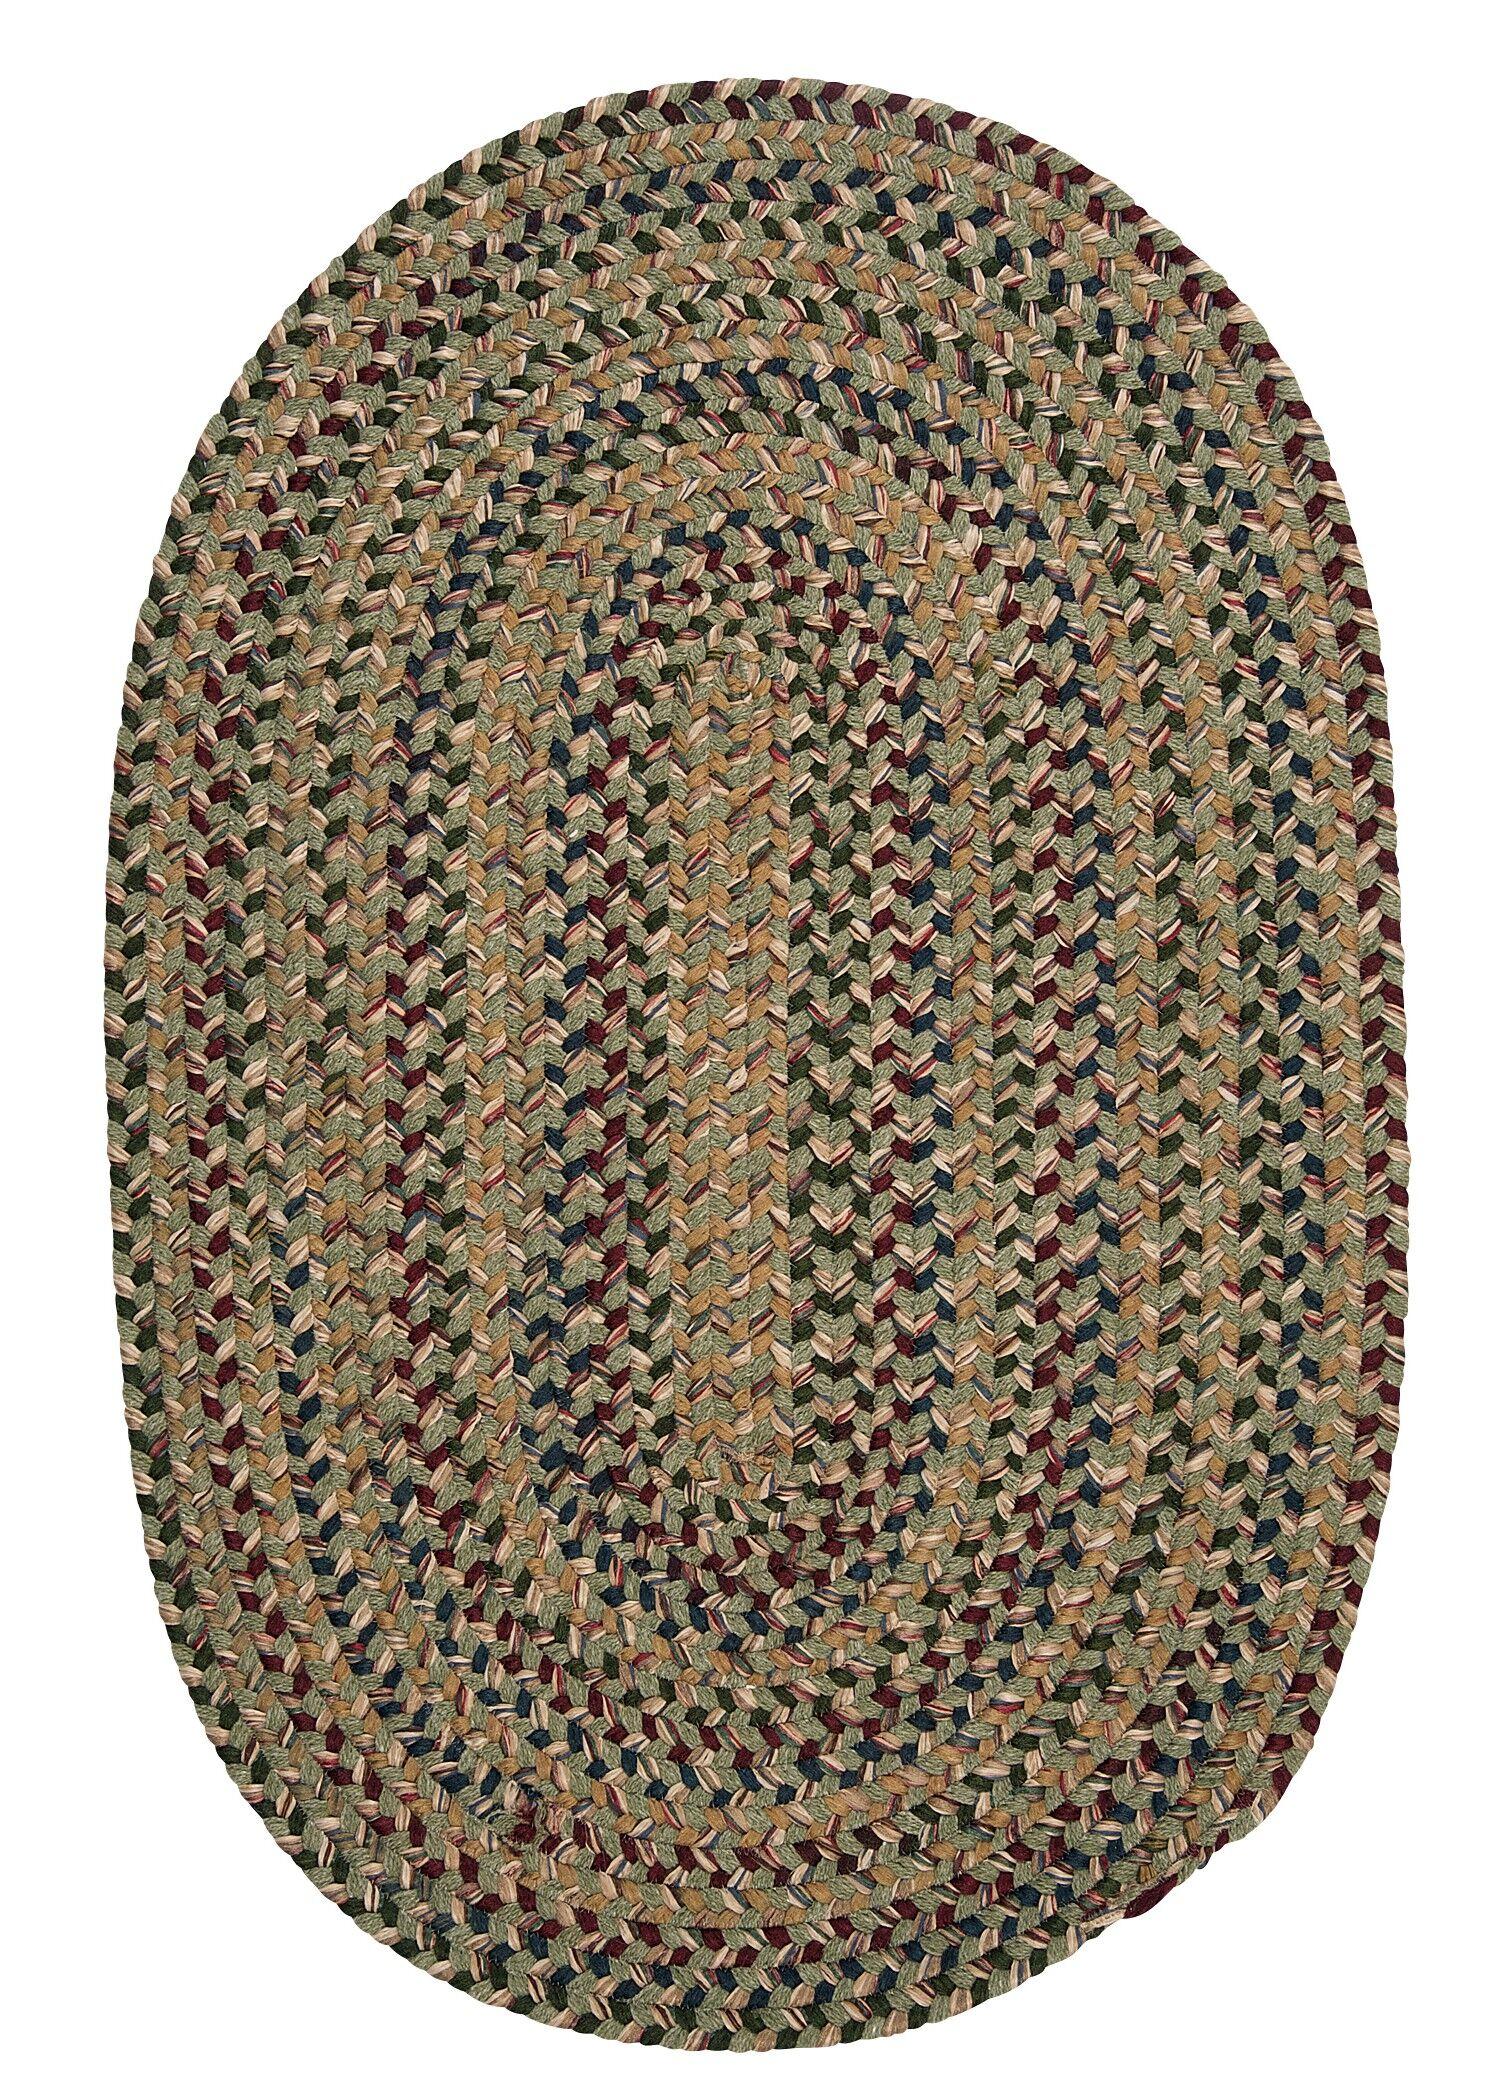 Greenlaw Palm Area Rug Rug Size: Oval 4' x 6'